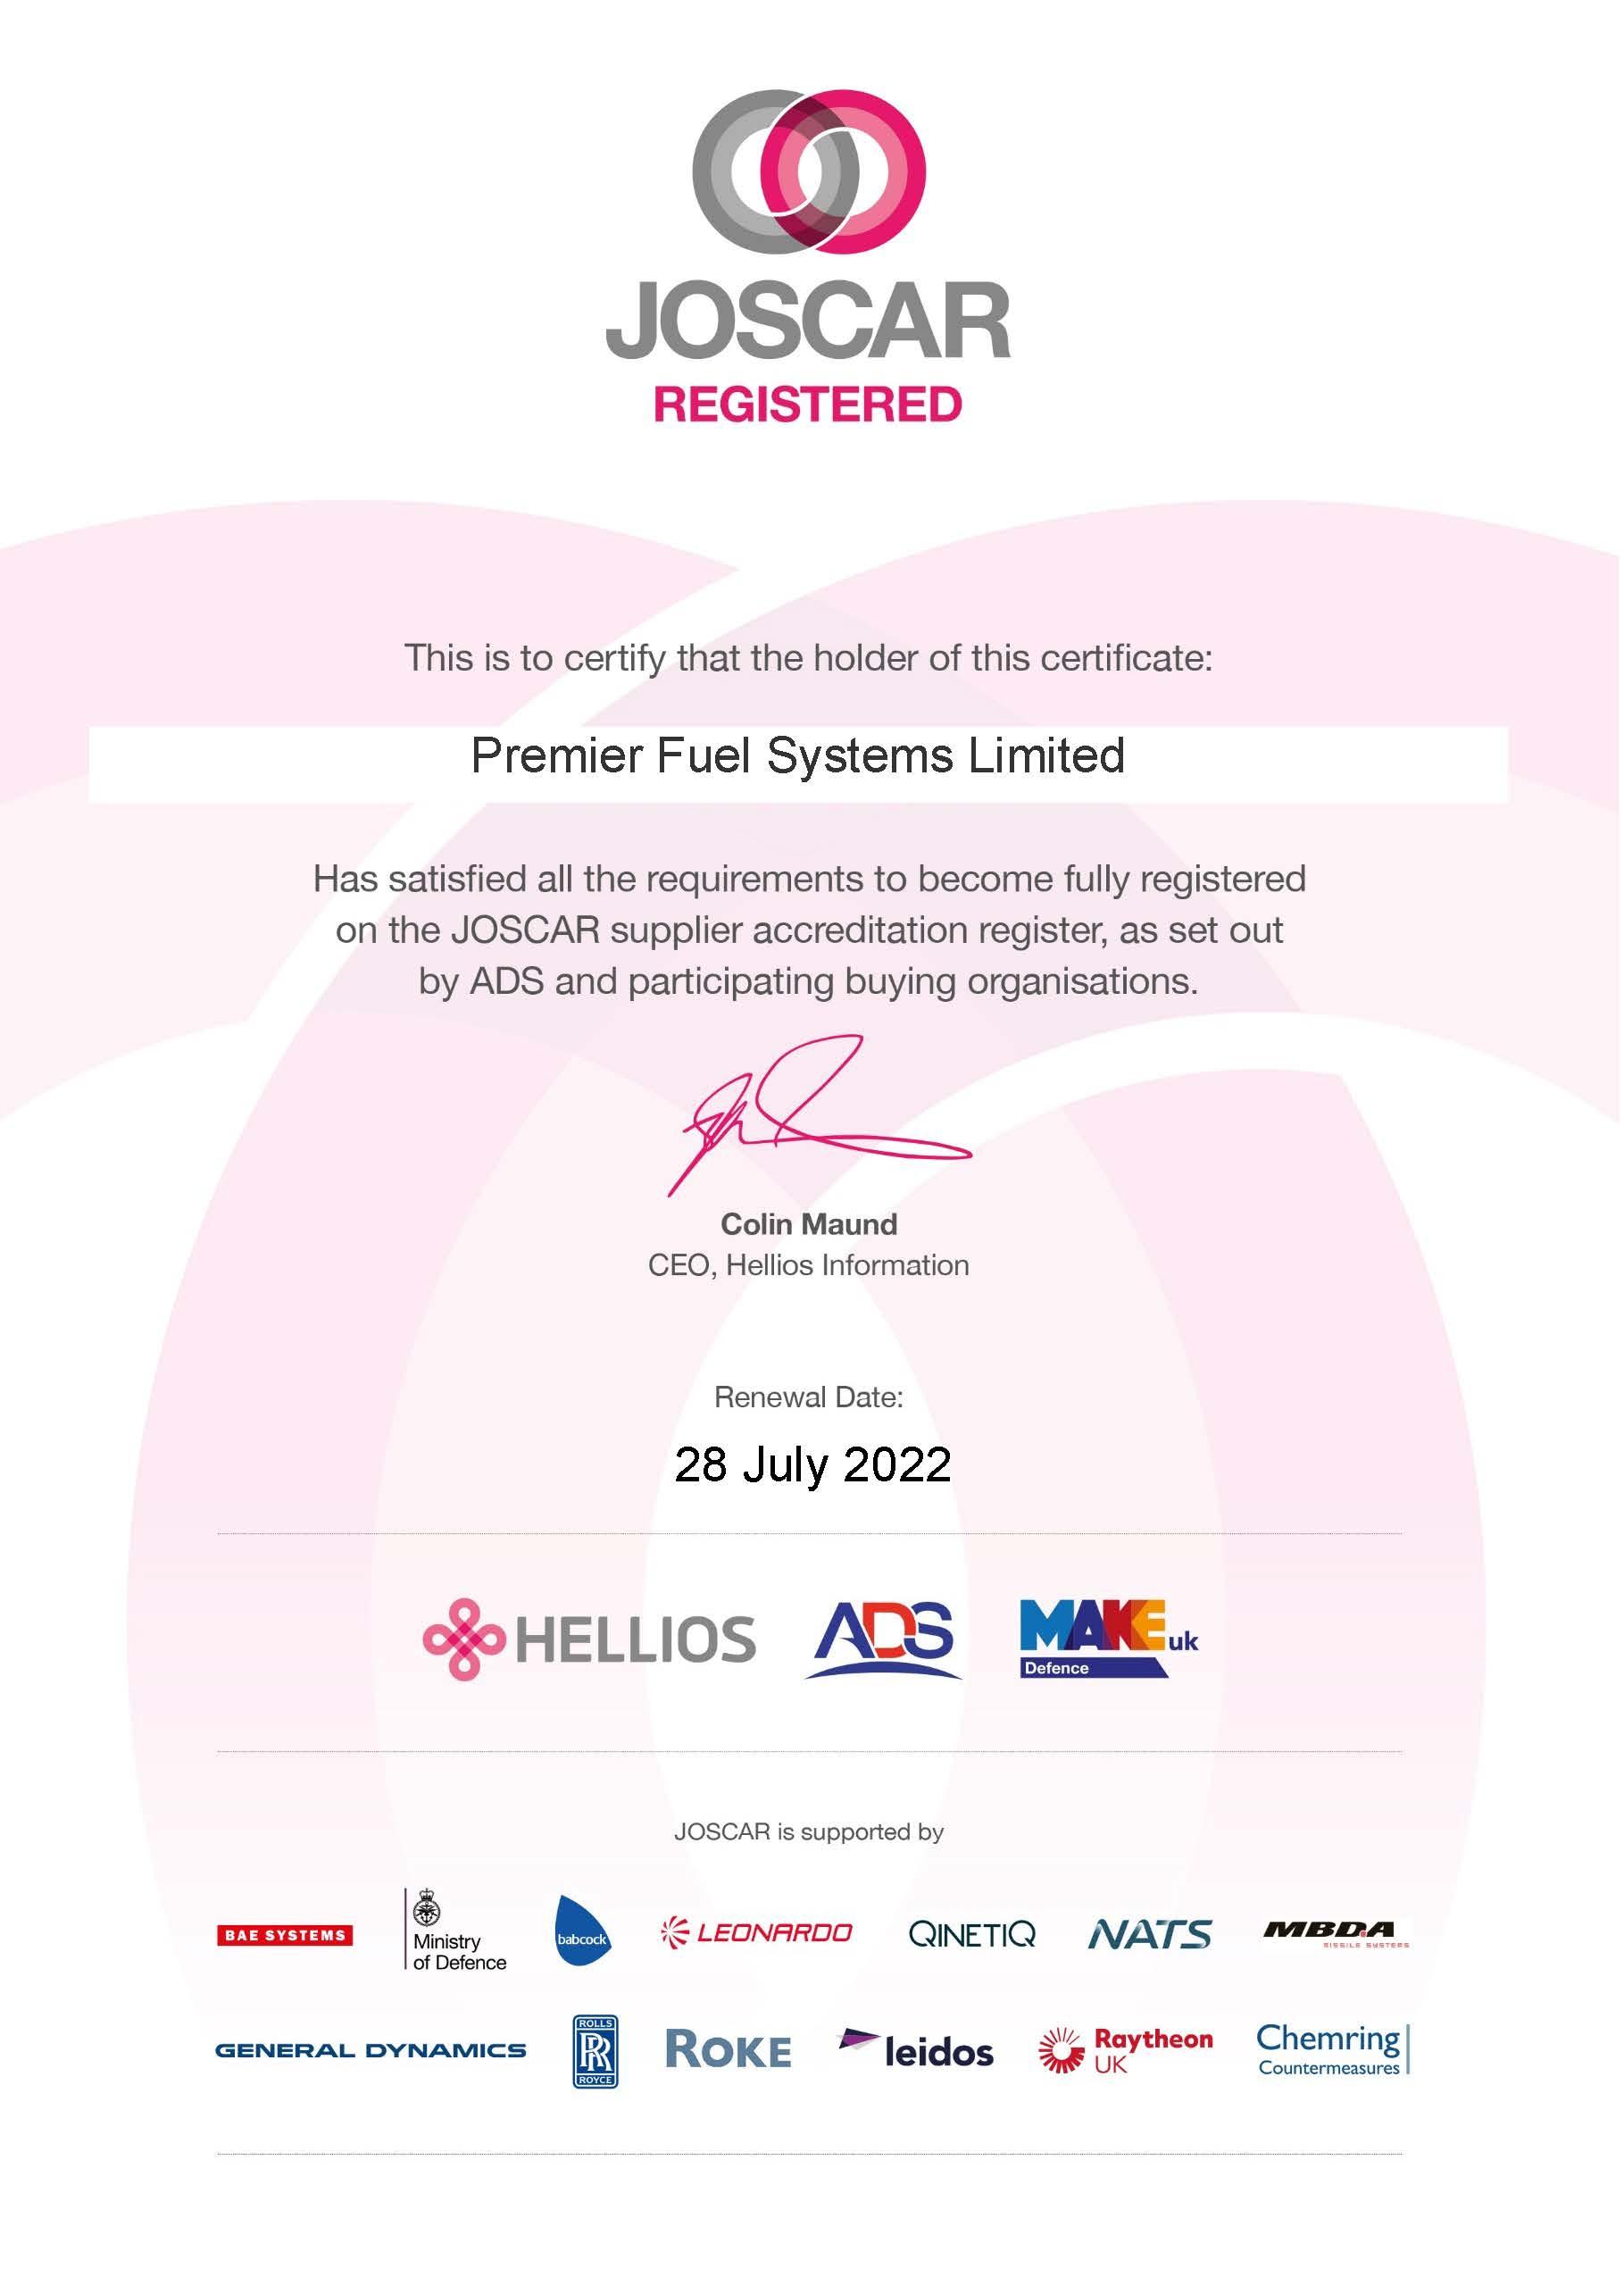 JOSCAR Certificate (Premier Fuel Systems Limited)